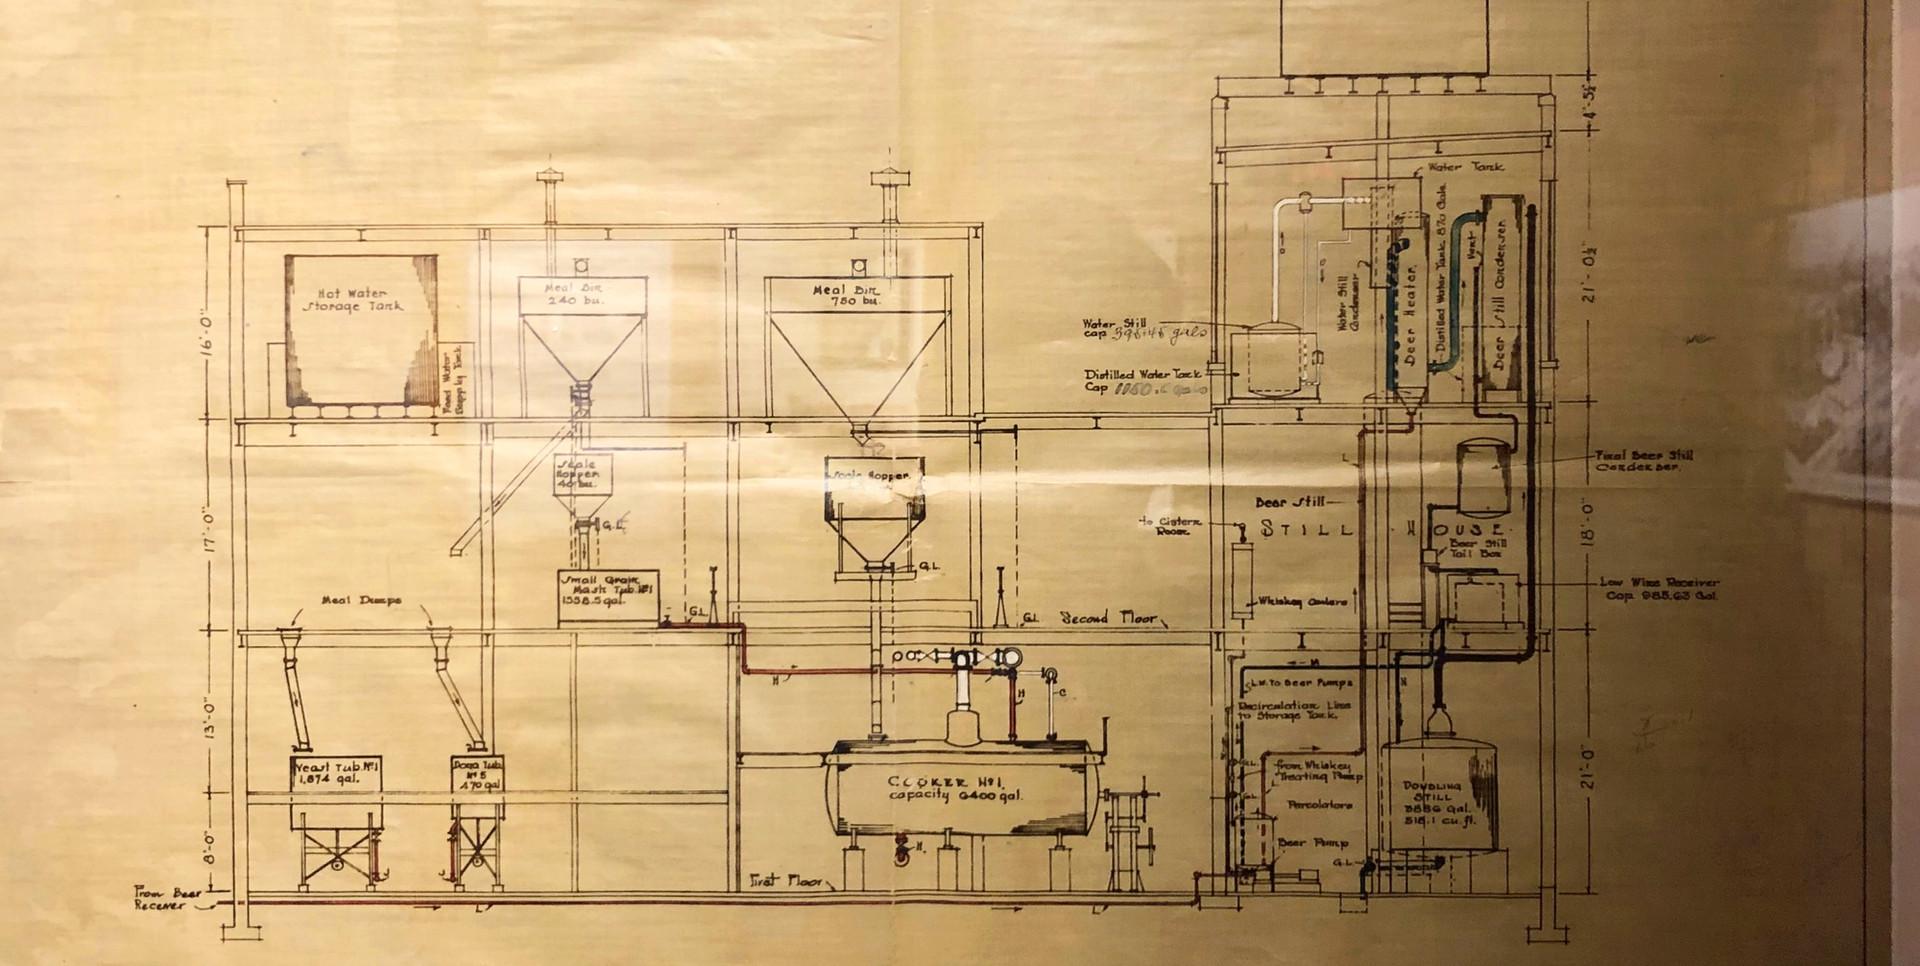 JEP Orginal Distillery Plans.jpg